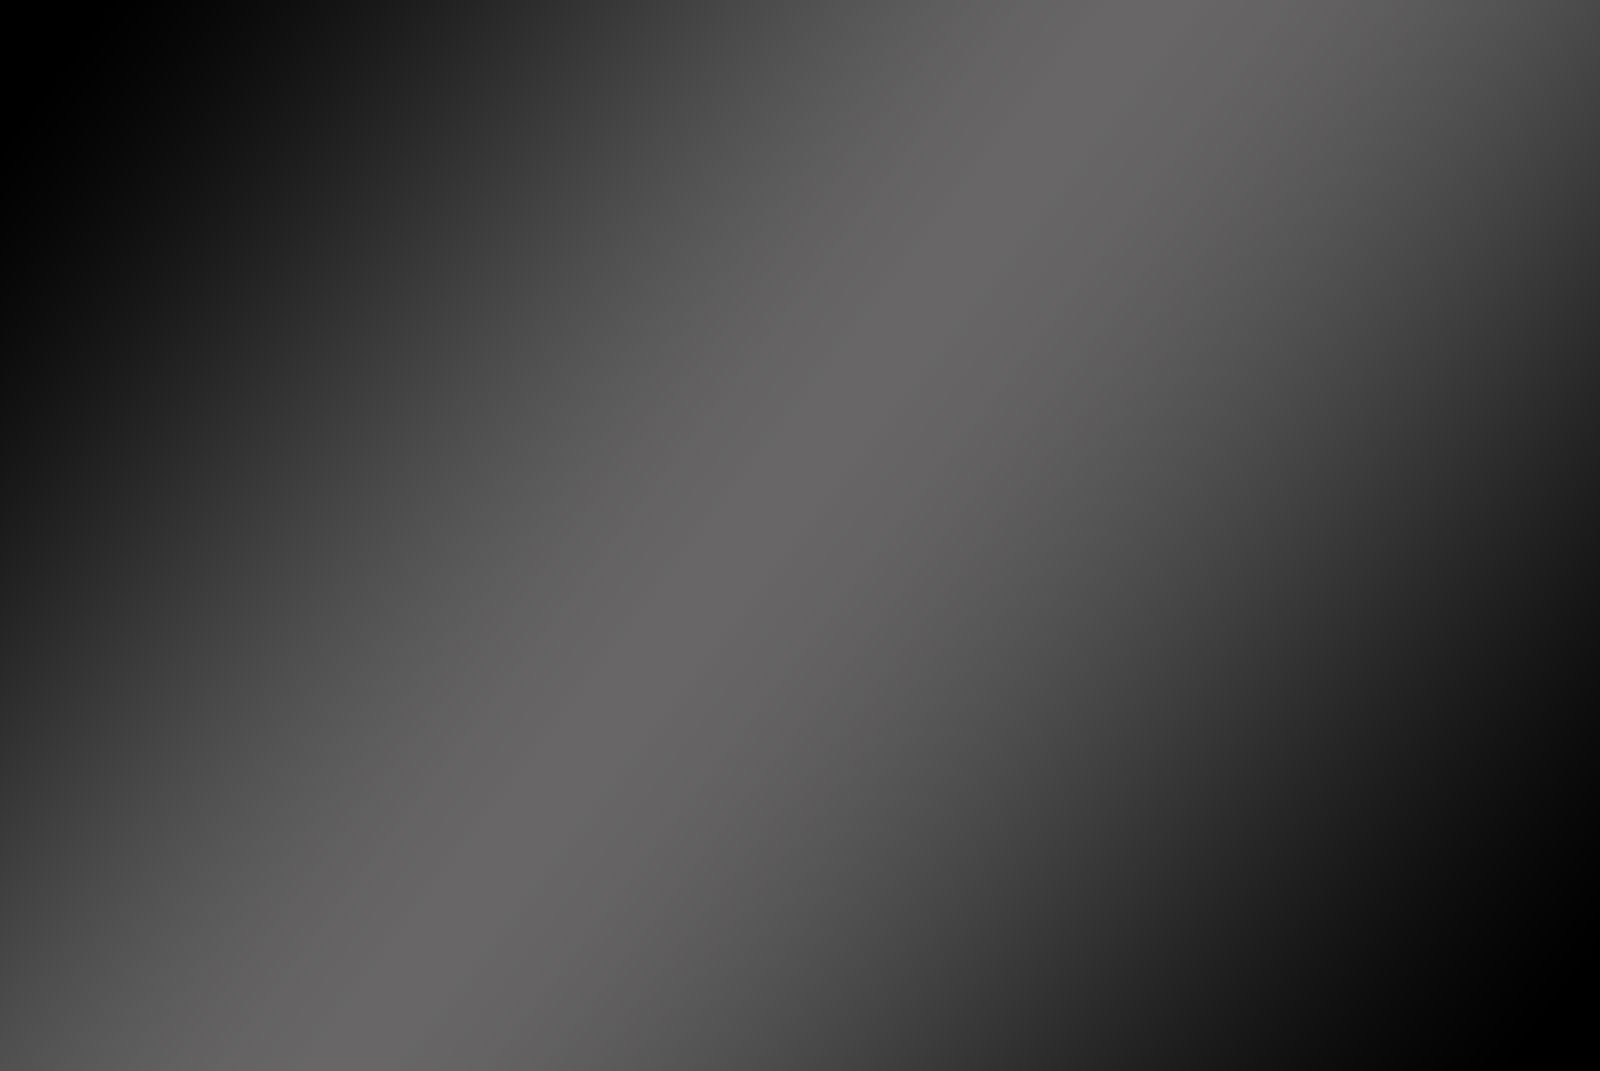 Black Gradient 1600x1071